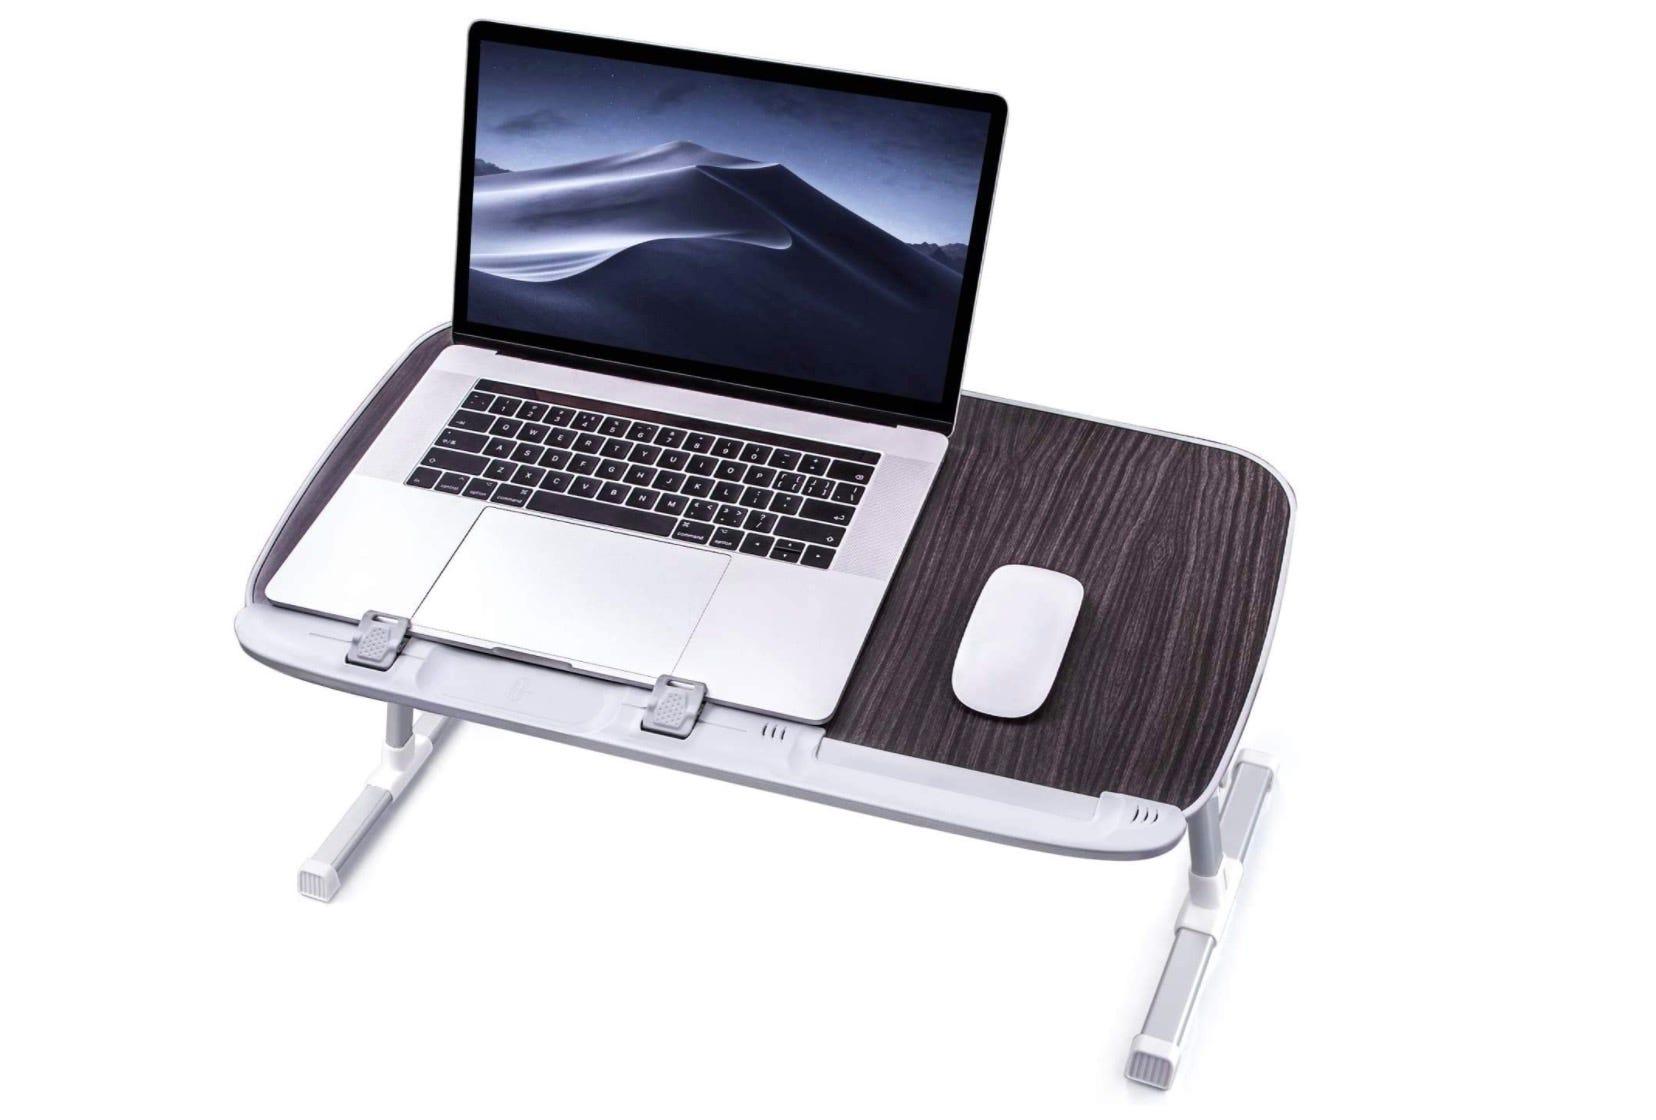 Taotronics metal lap desk